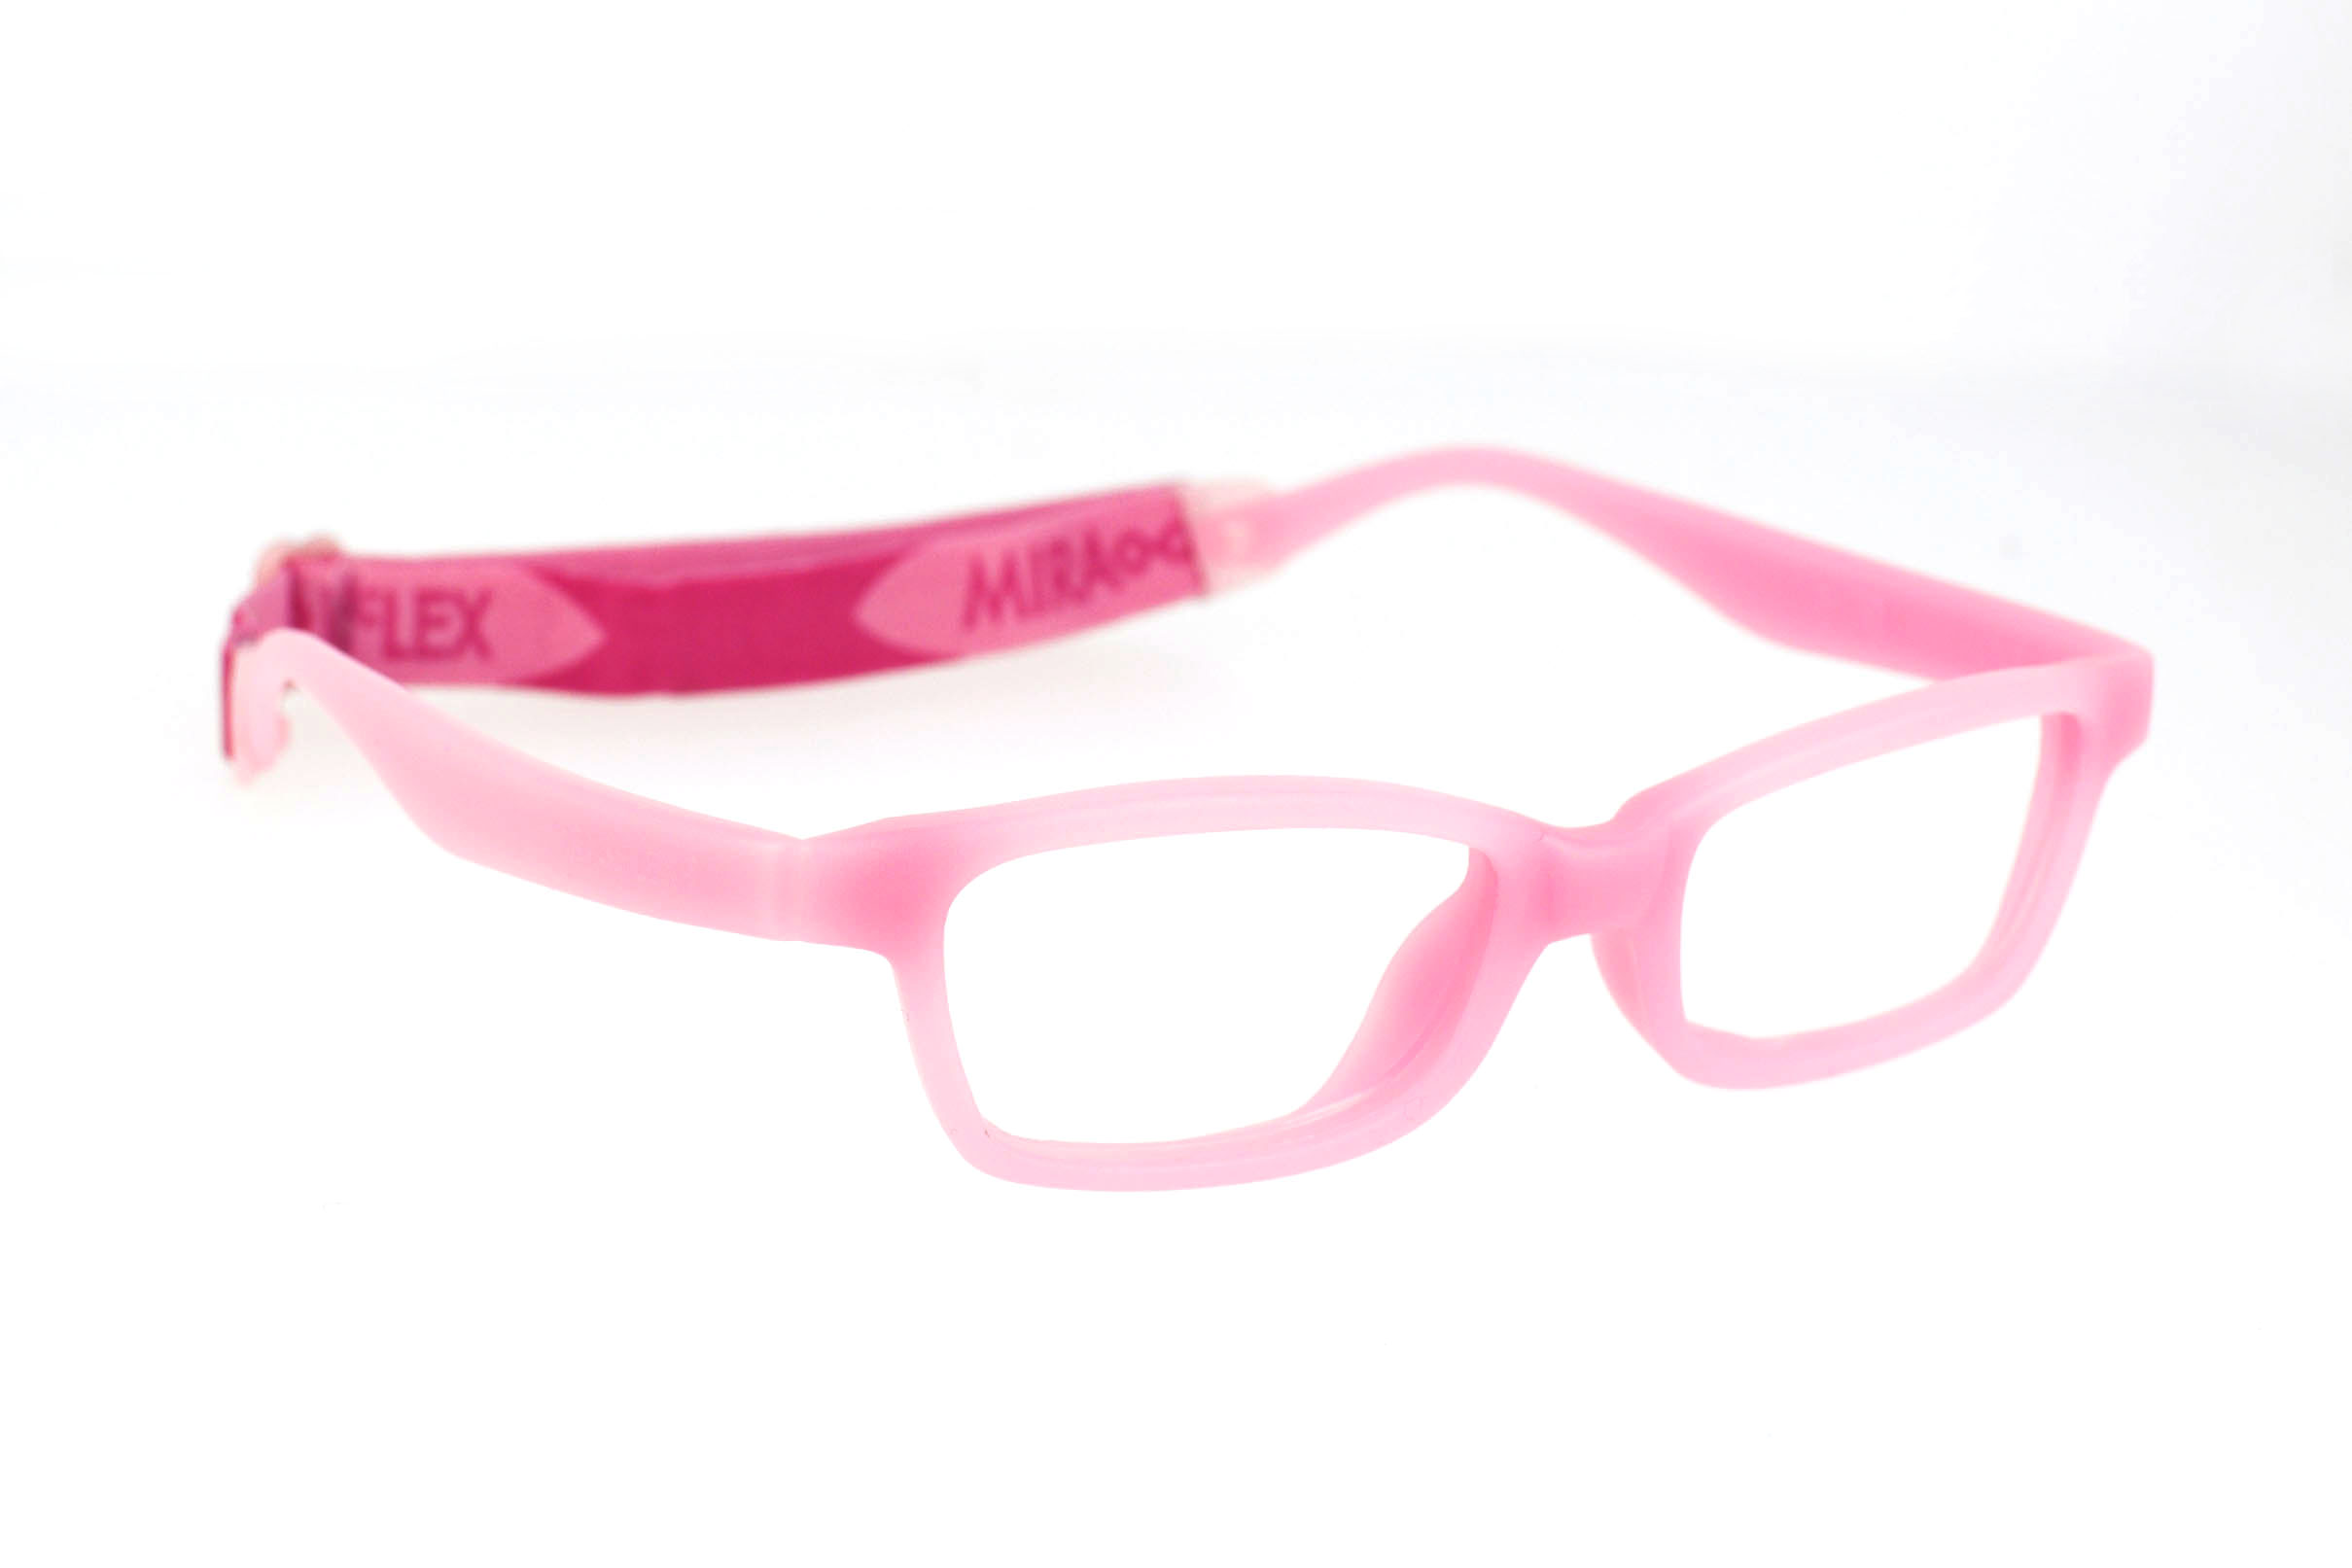 dbebc73114a Miraflex Mayan 39 Eyeglasses Pink-B Mayan 39-B - Optiwow